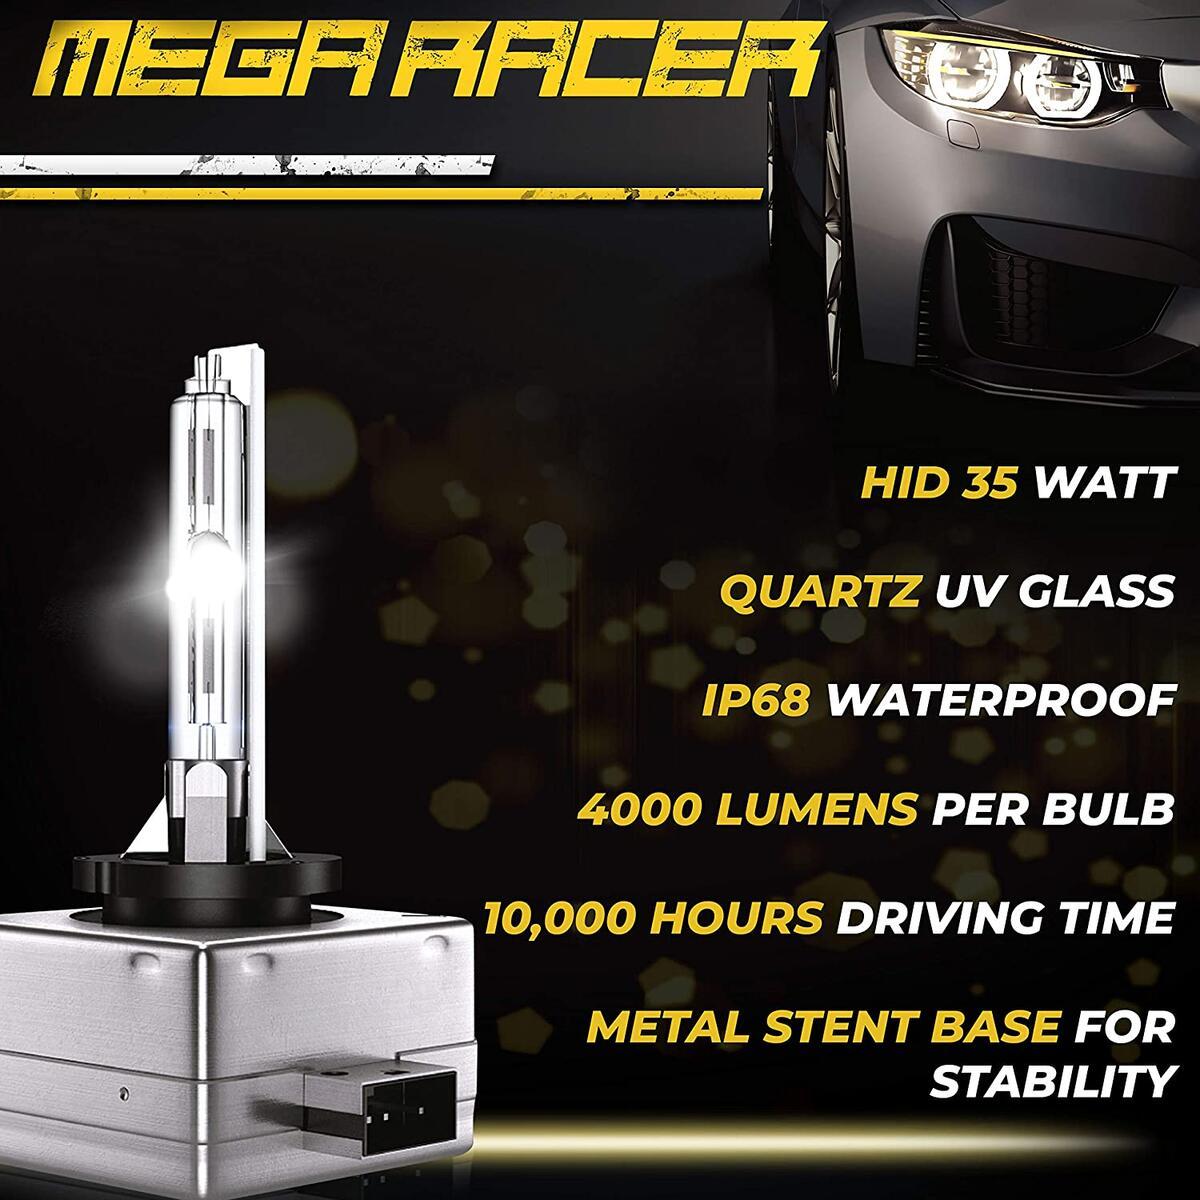 Mega Racer D1C/D1R/D1S HID Headlight Bulb for High Beam Low Beam 35W 6000K Diamond White 8000 Lumens Xenon Headlights IP68 Waterproof, Pack of 2